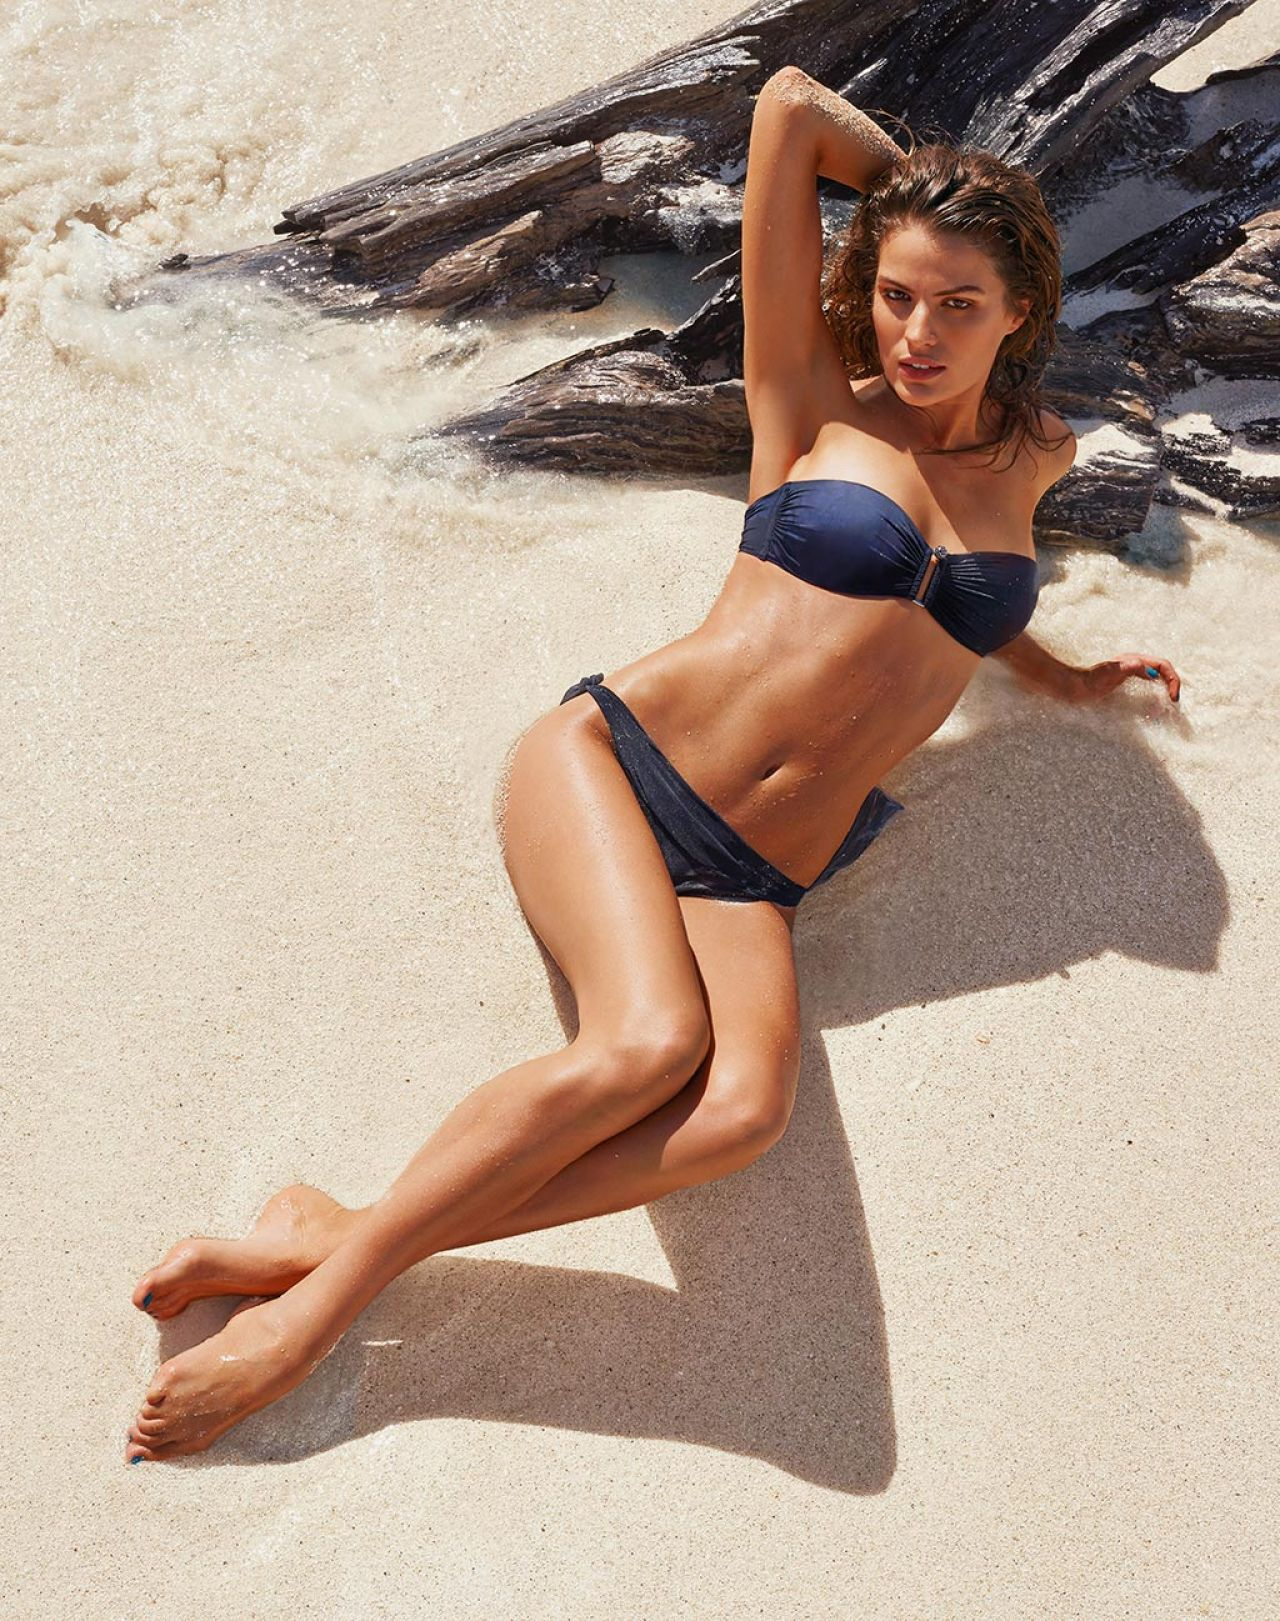 Cameron Russell en bikini sur la plage